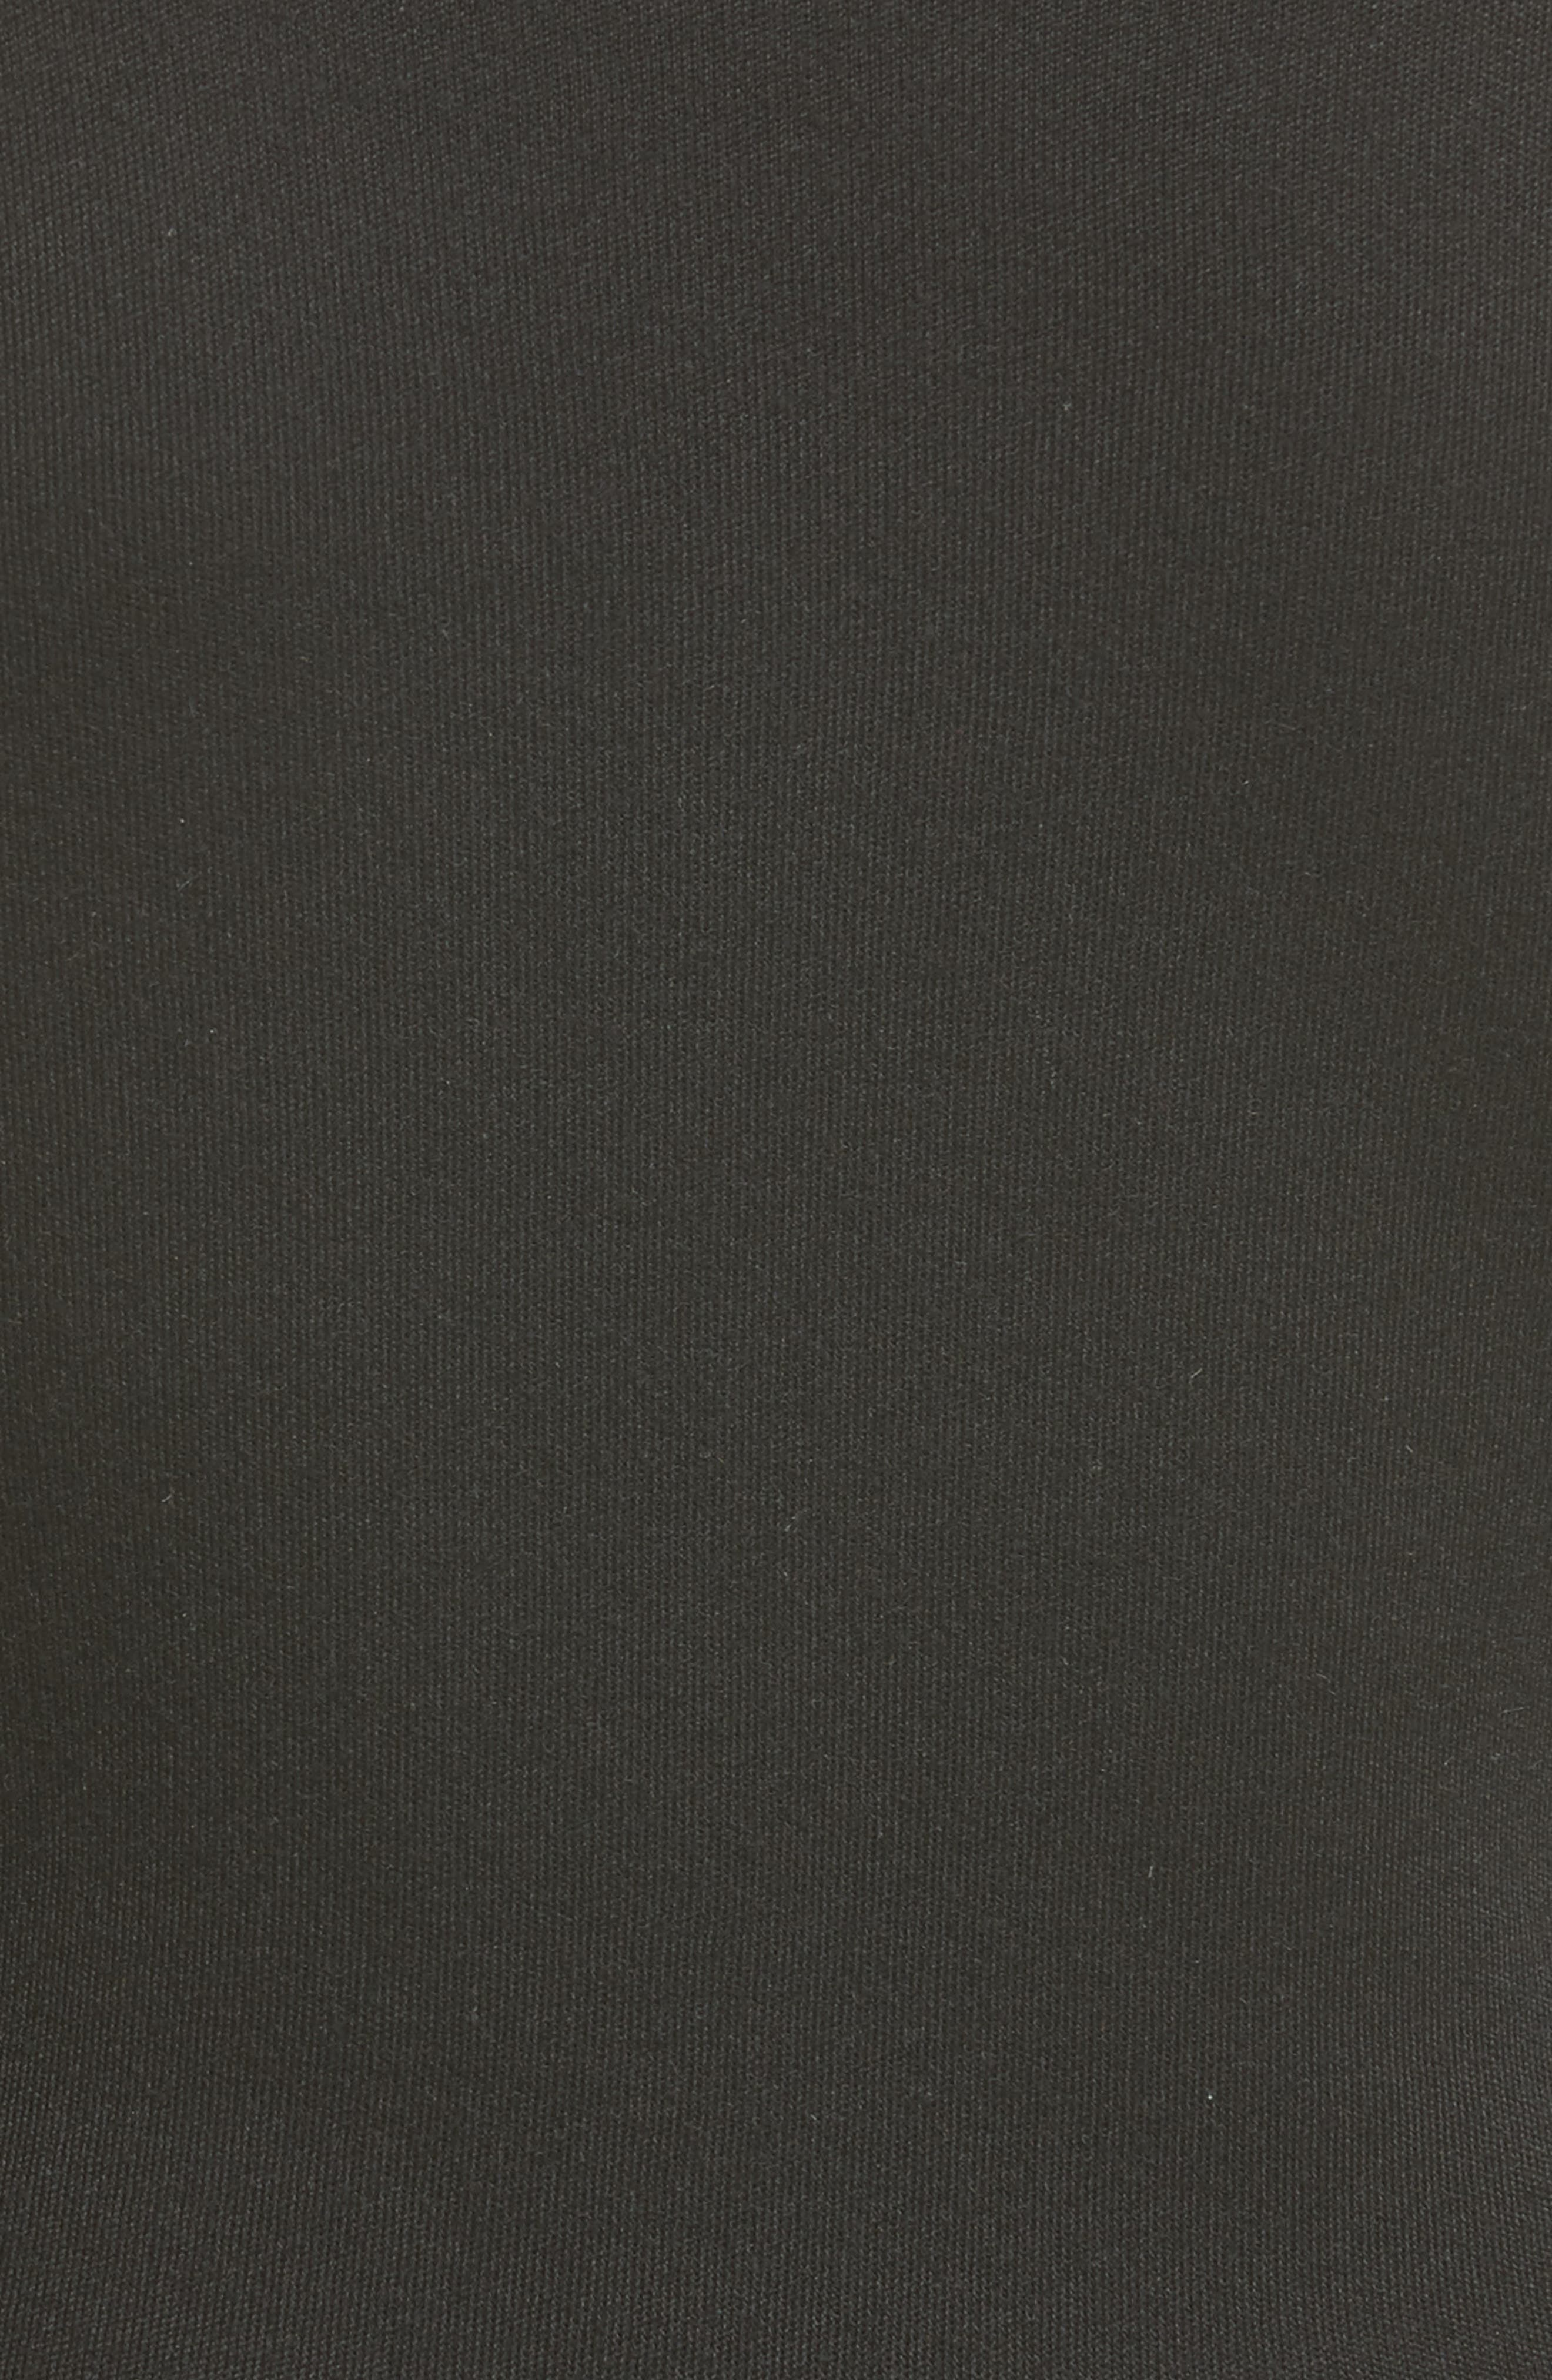 Alternate Image 3  - Michael Kors Cashmere V-Neck Sweater